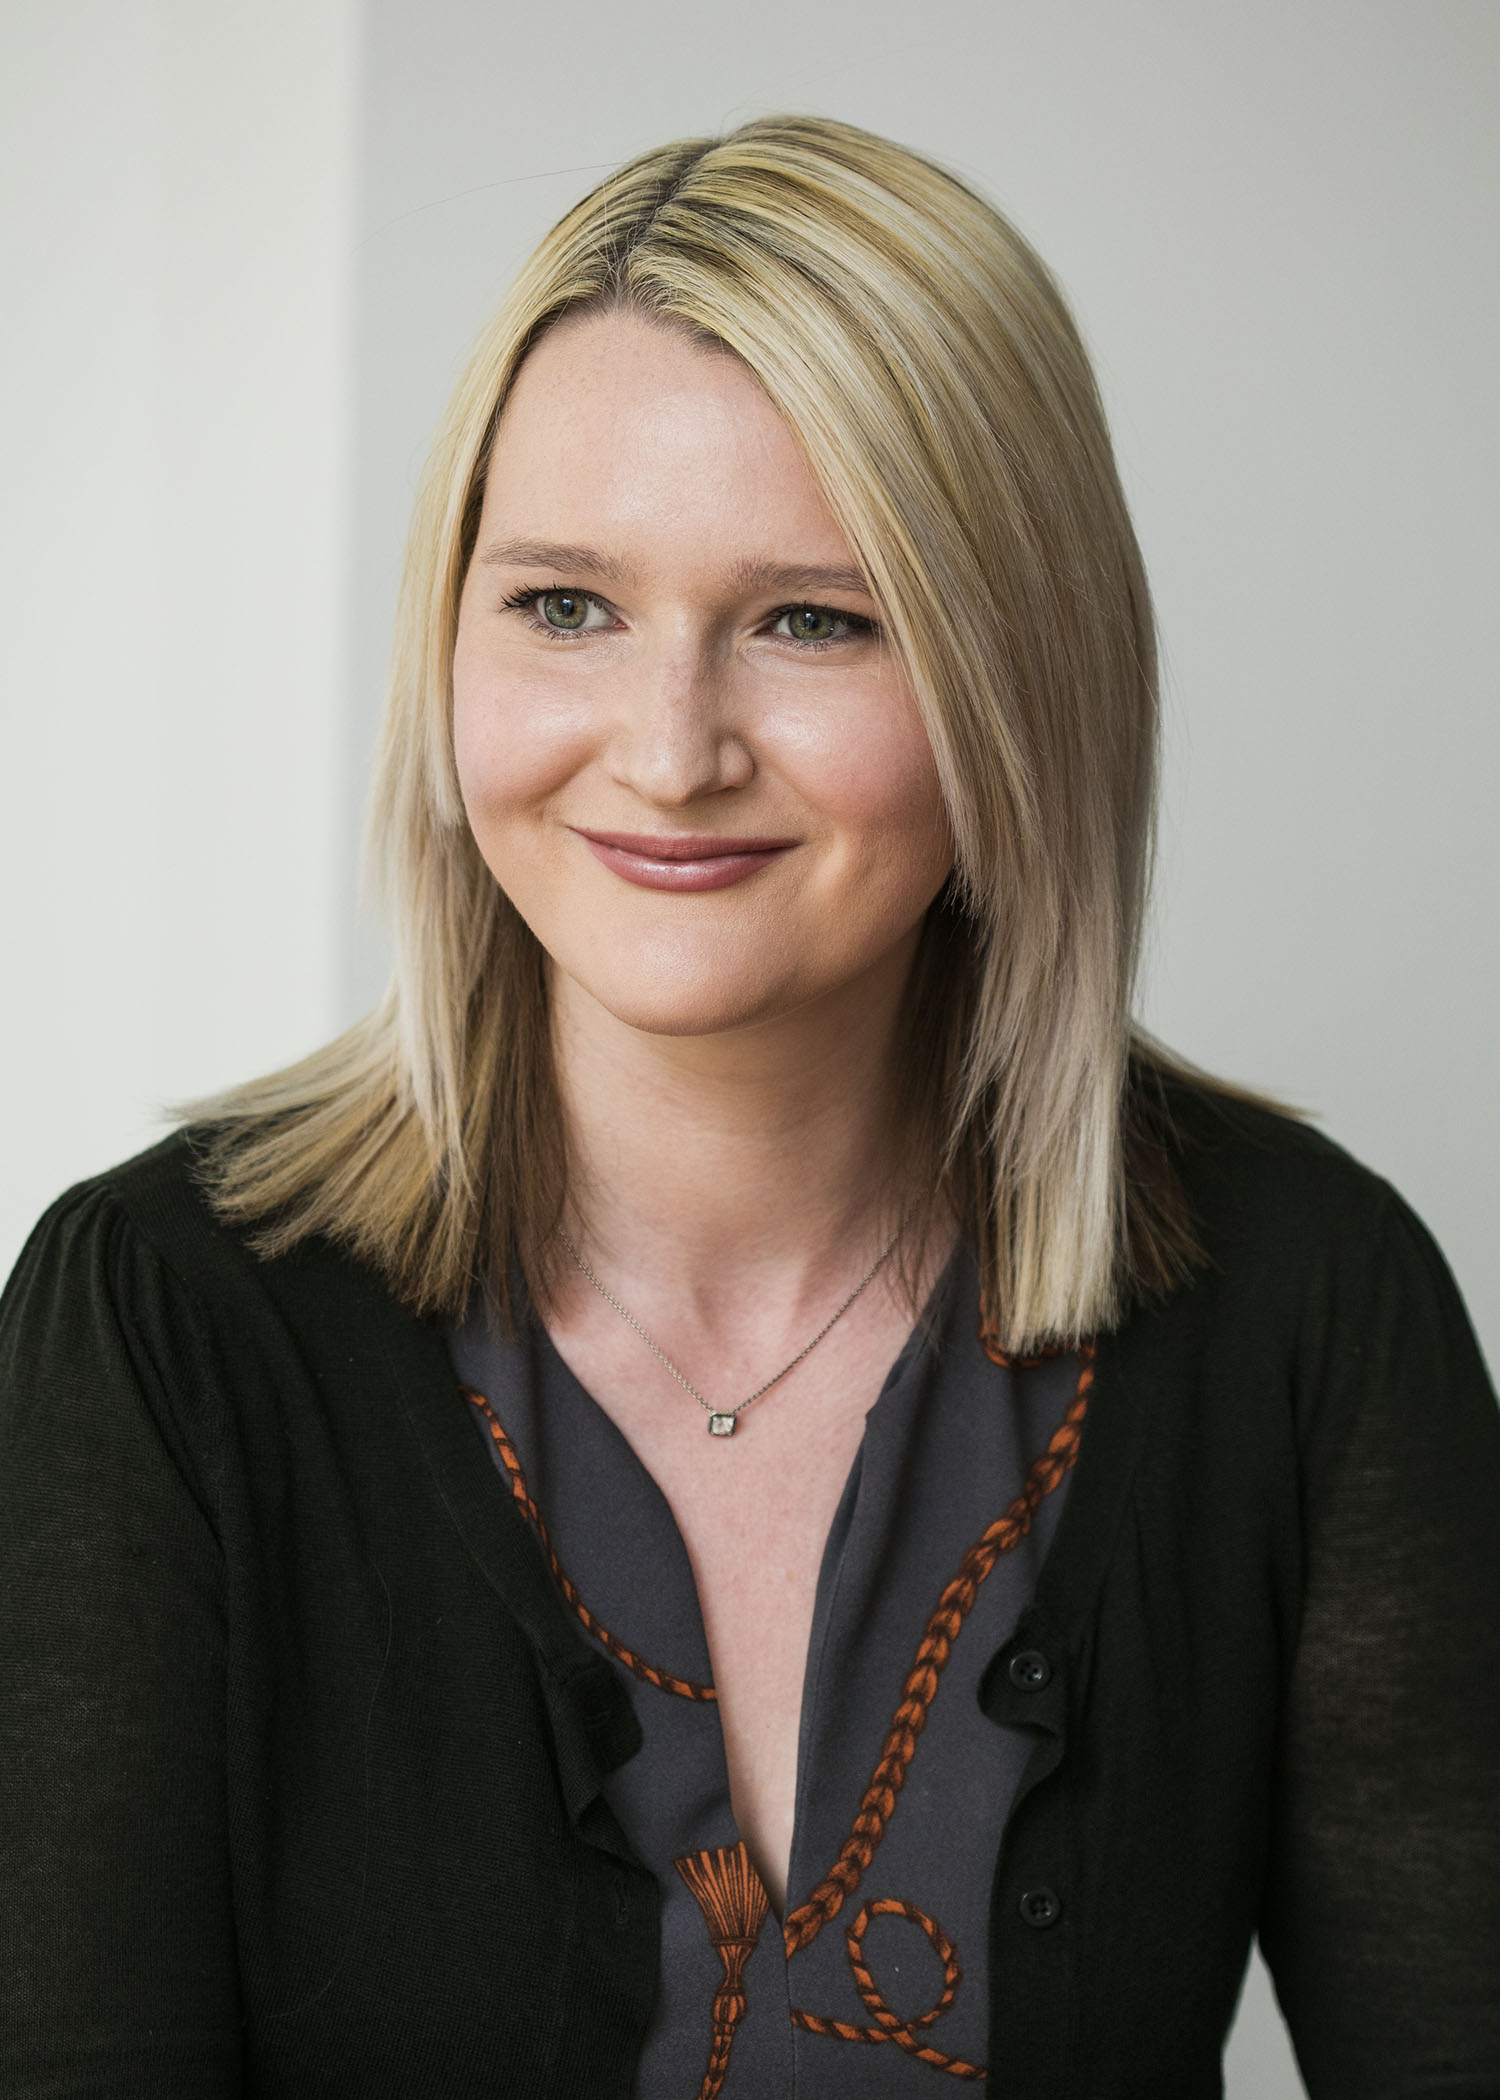 Victoria Edwardes